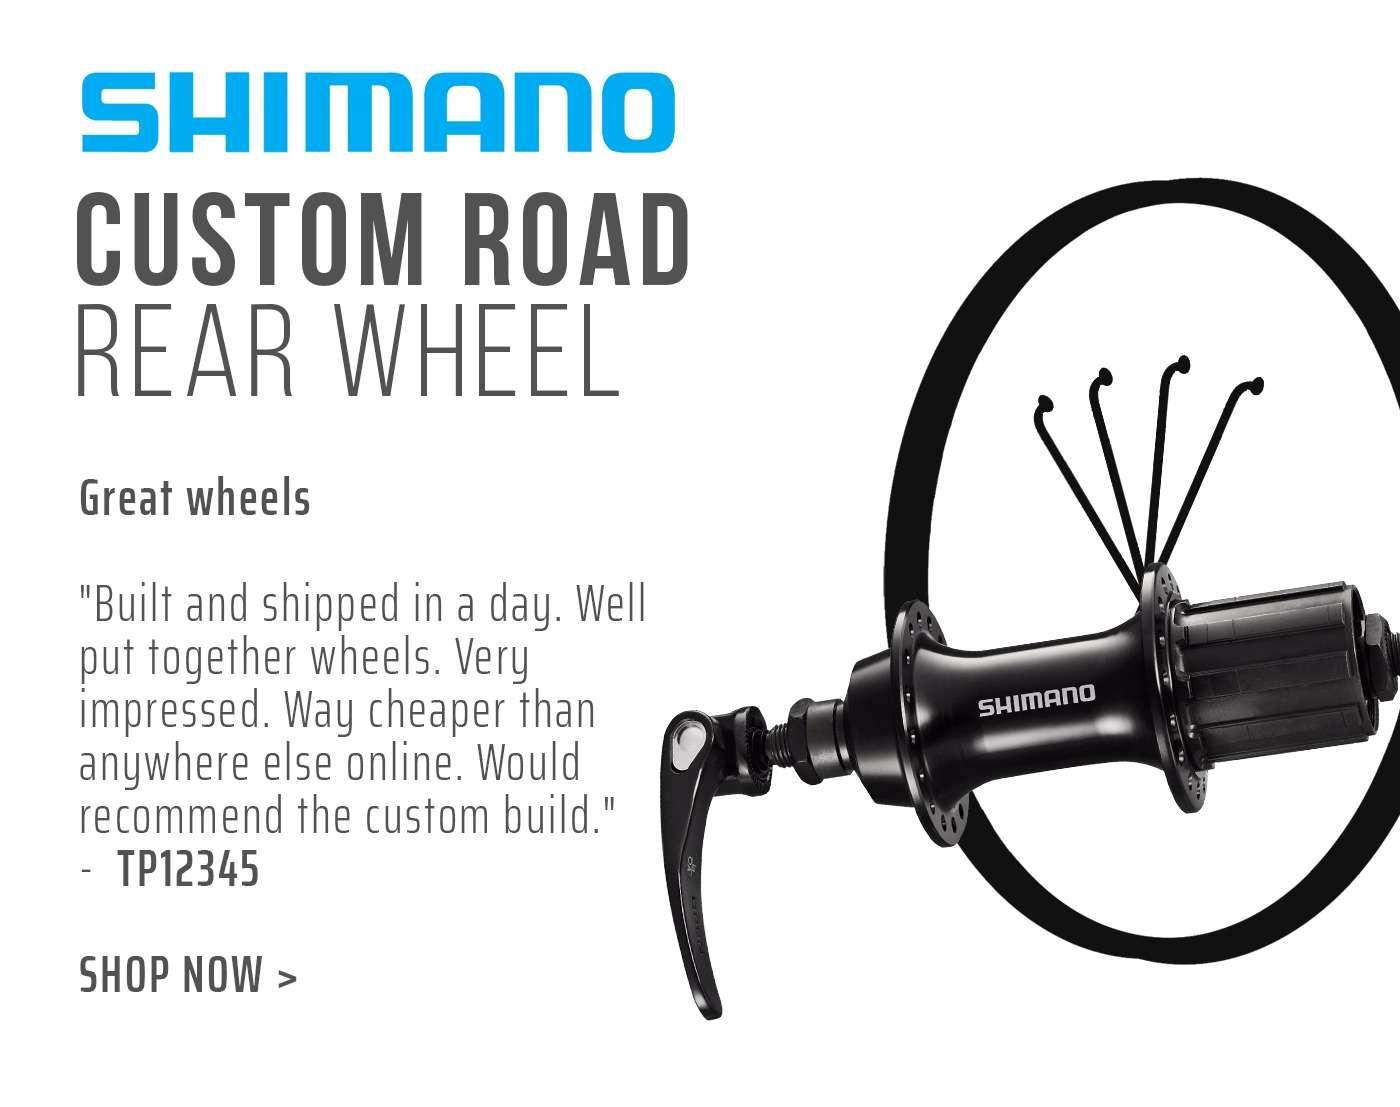 Shimano Custom Road Rear Wheel